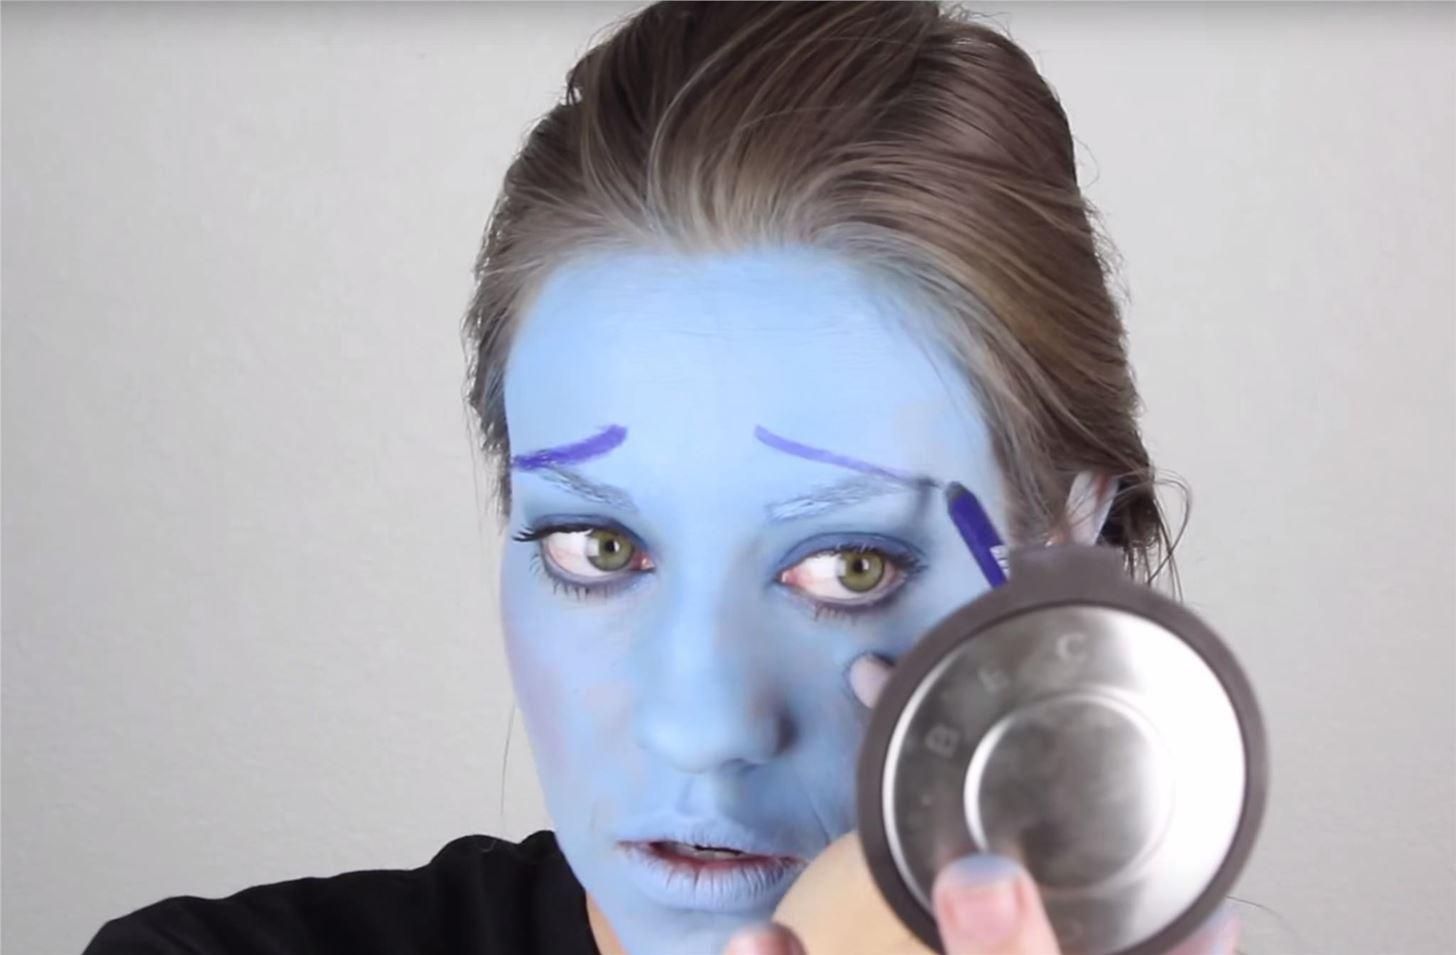 Inside Out: DIY Sadness Costume & Makeup for Halloween